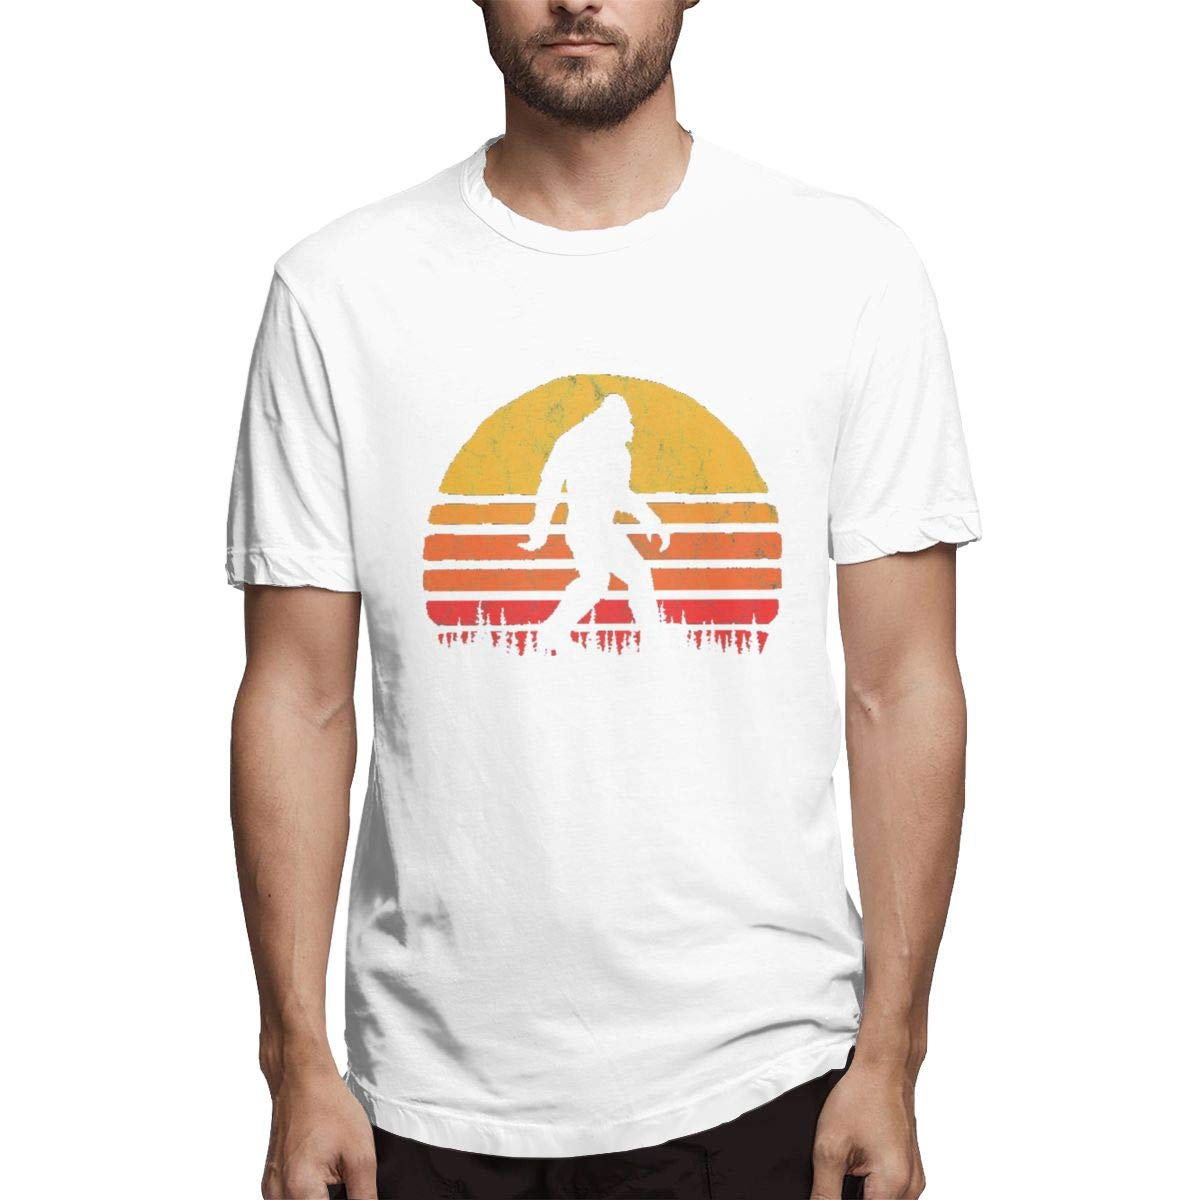 LANBRELLA Mens Retro Bigfoot Silhouette Sun Casual Crew-Neck Short Sleeve T-Shirts for Men